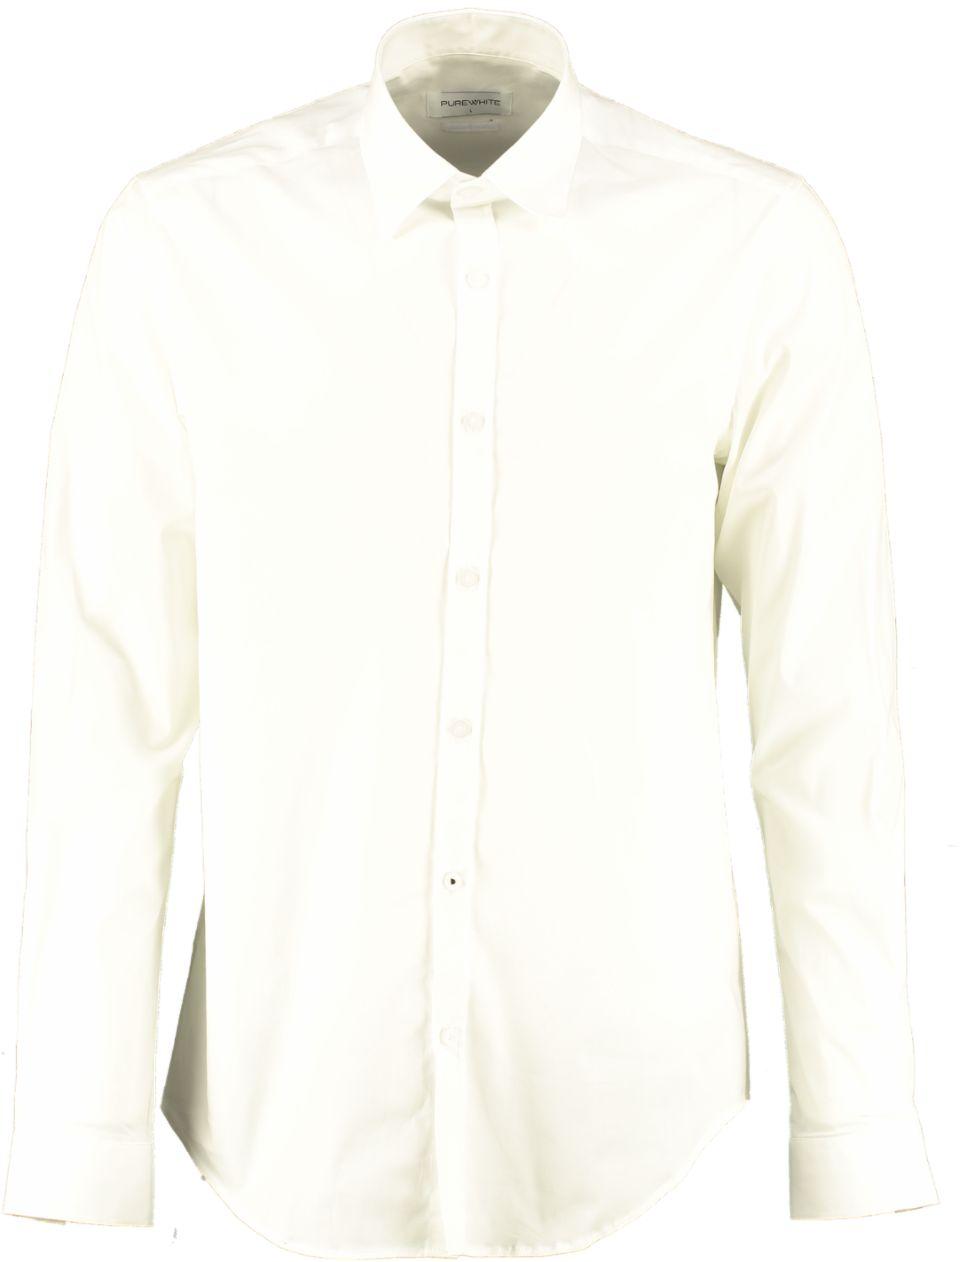 Purewhite Casual Shirt